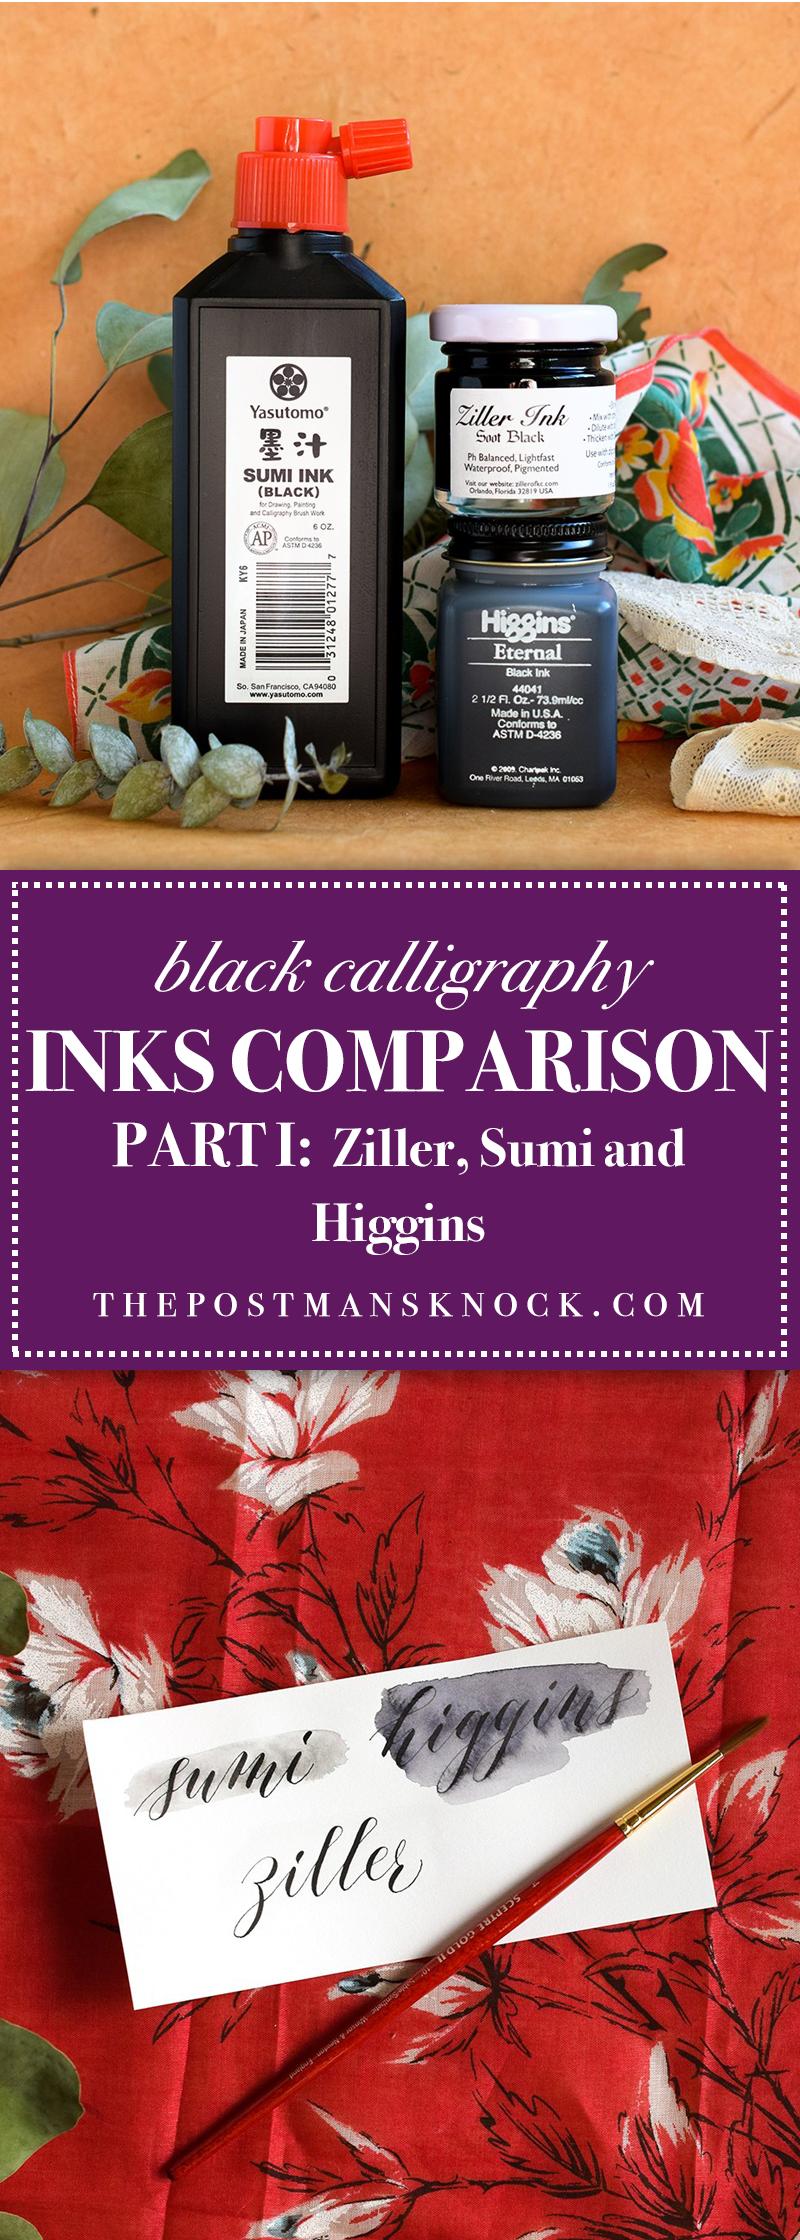 Black Calligraphy Inks Comparison Part I Ziller Sumi